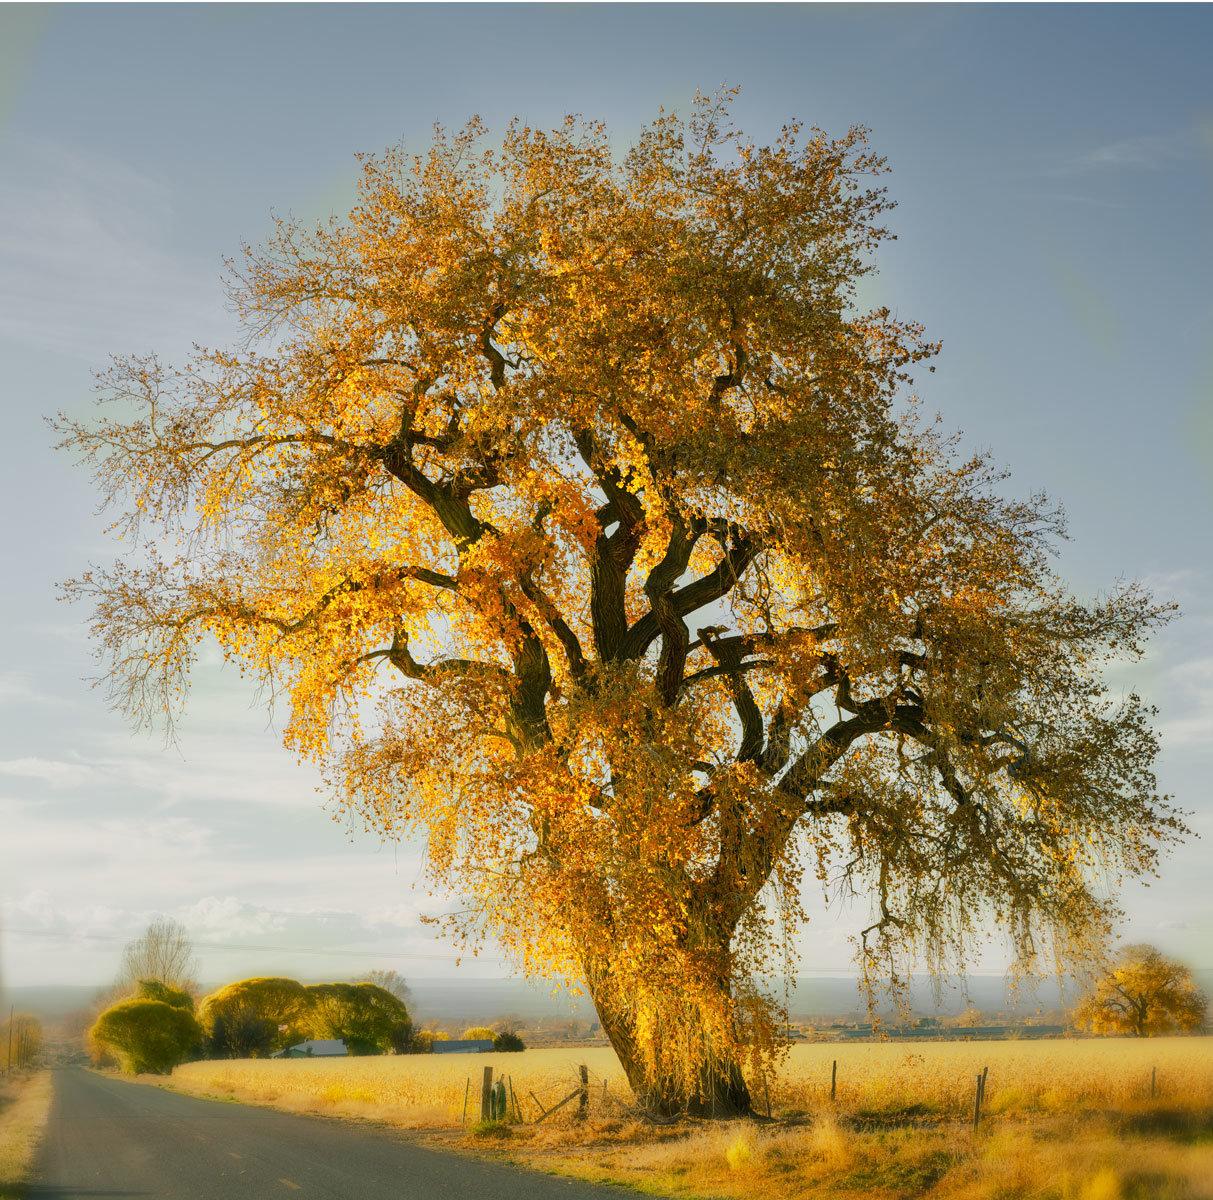 CottonwoodFalconRd_DSC1596-1.jpg